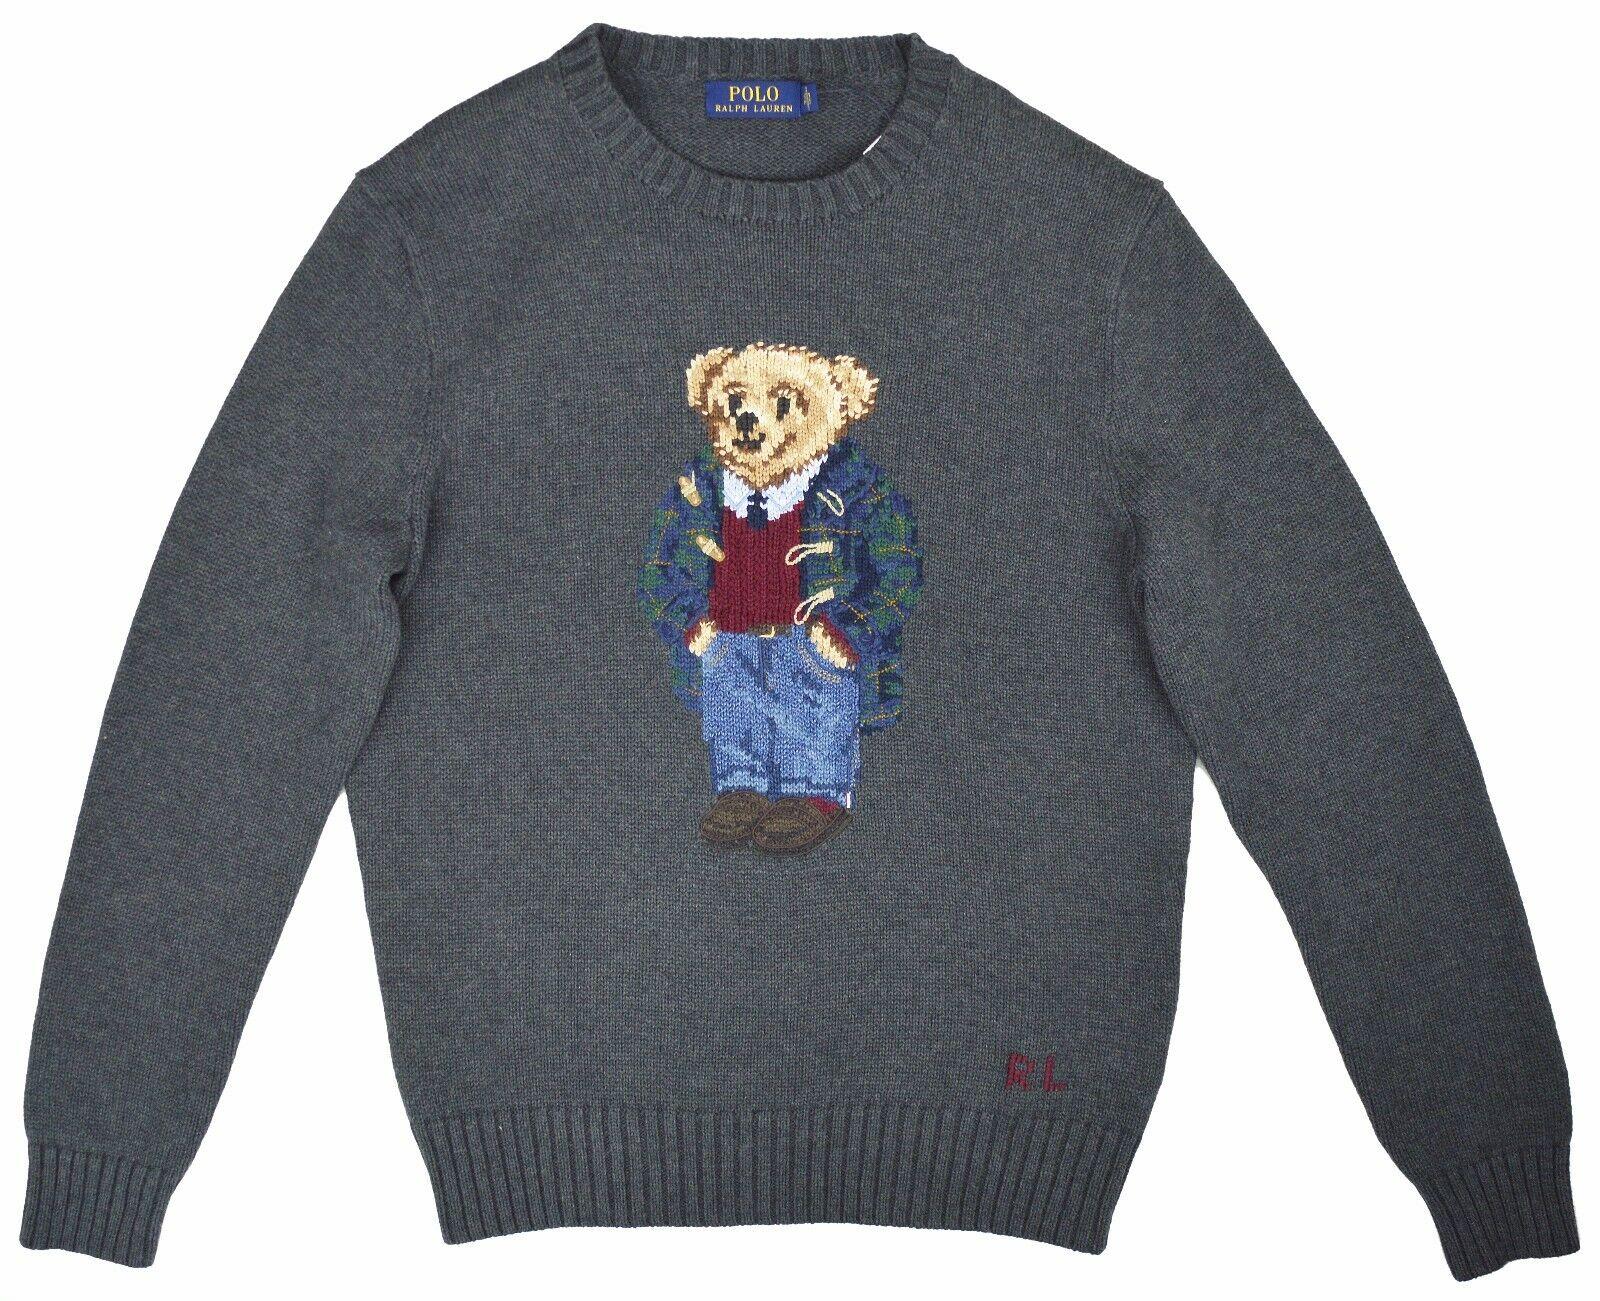 Polo RALPH LAUREN Big Pony Logo Zip Fleece Hoodie Size Small VERY RARE RRP £130 | eBay